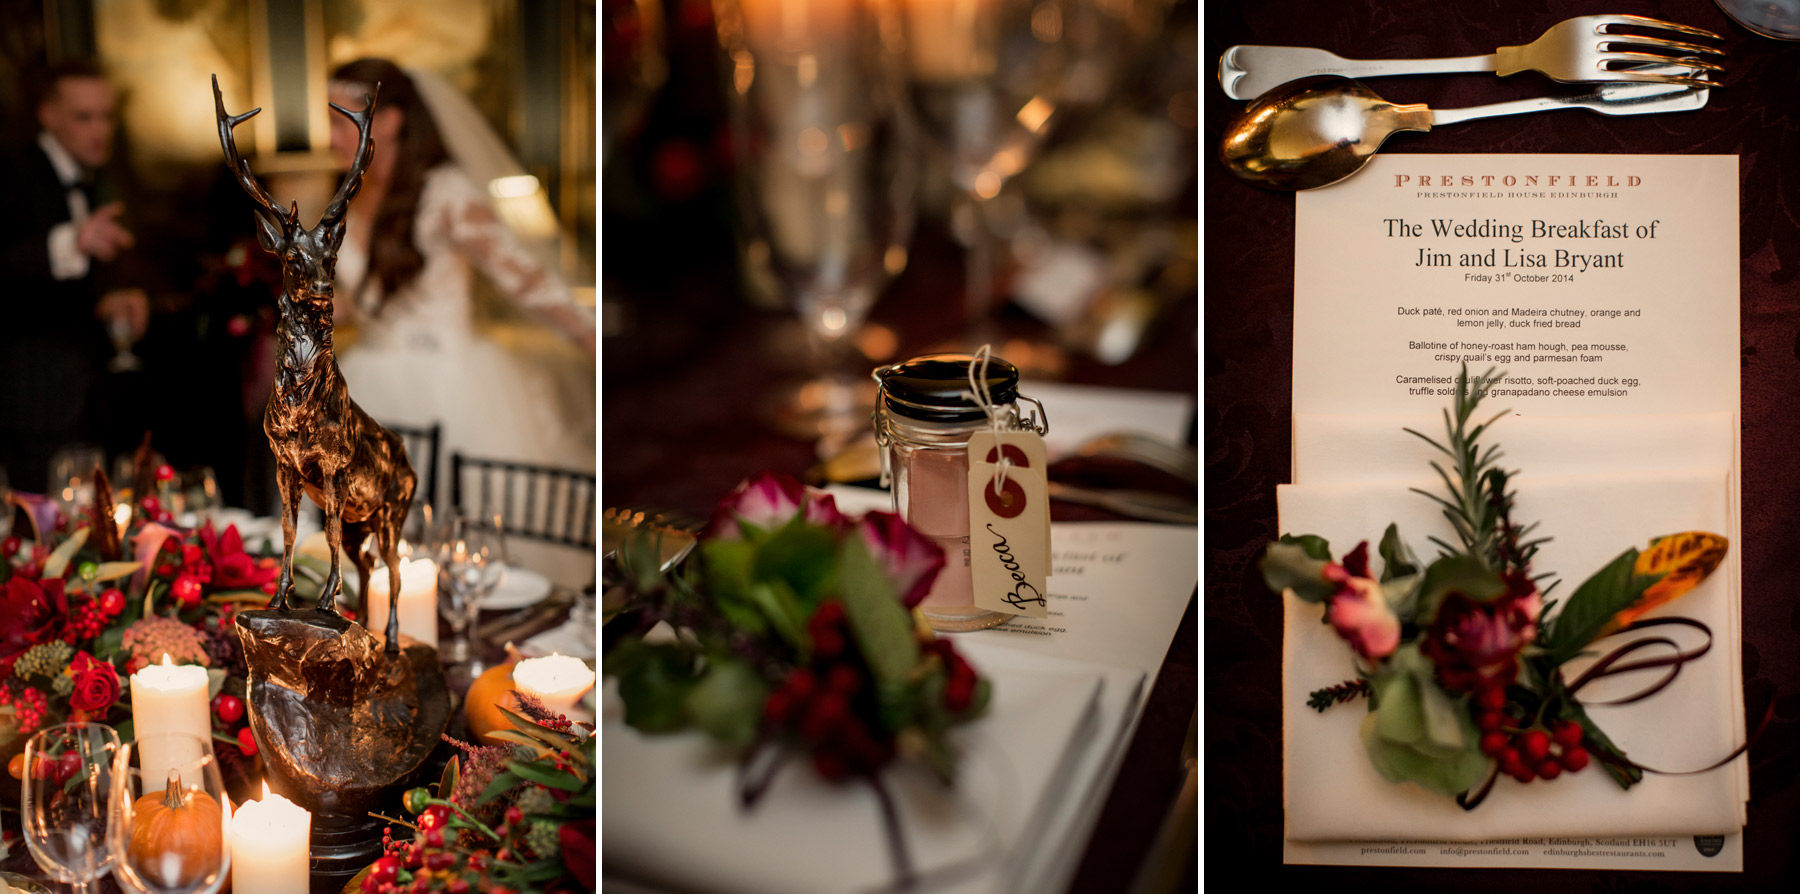 table setting wedding at prestonfiled house